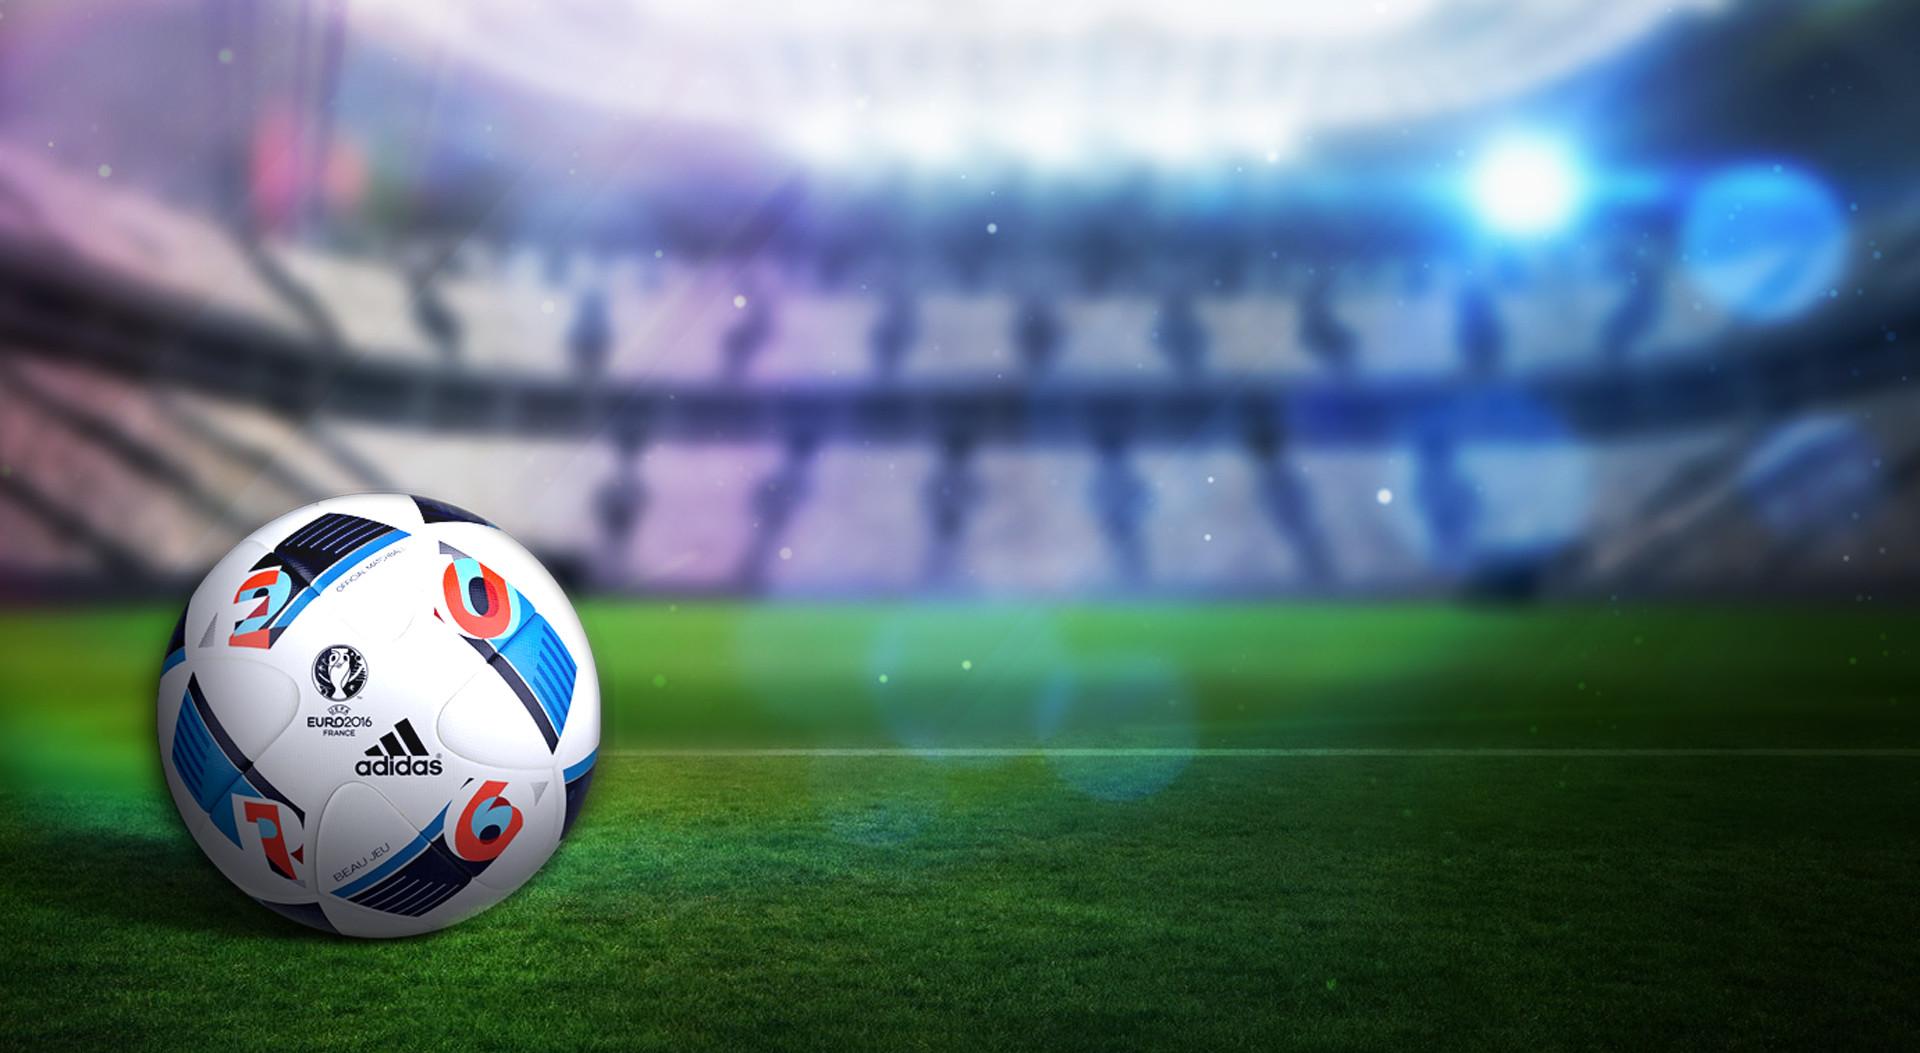 Fondo Con Iconos De Deporte: UEFA Euro 2016 Fondo De Pantalla And Fondo De Escritorio